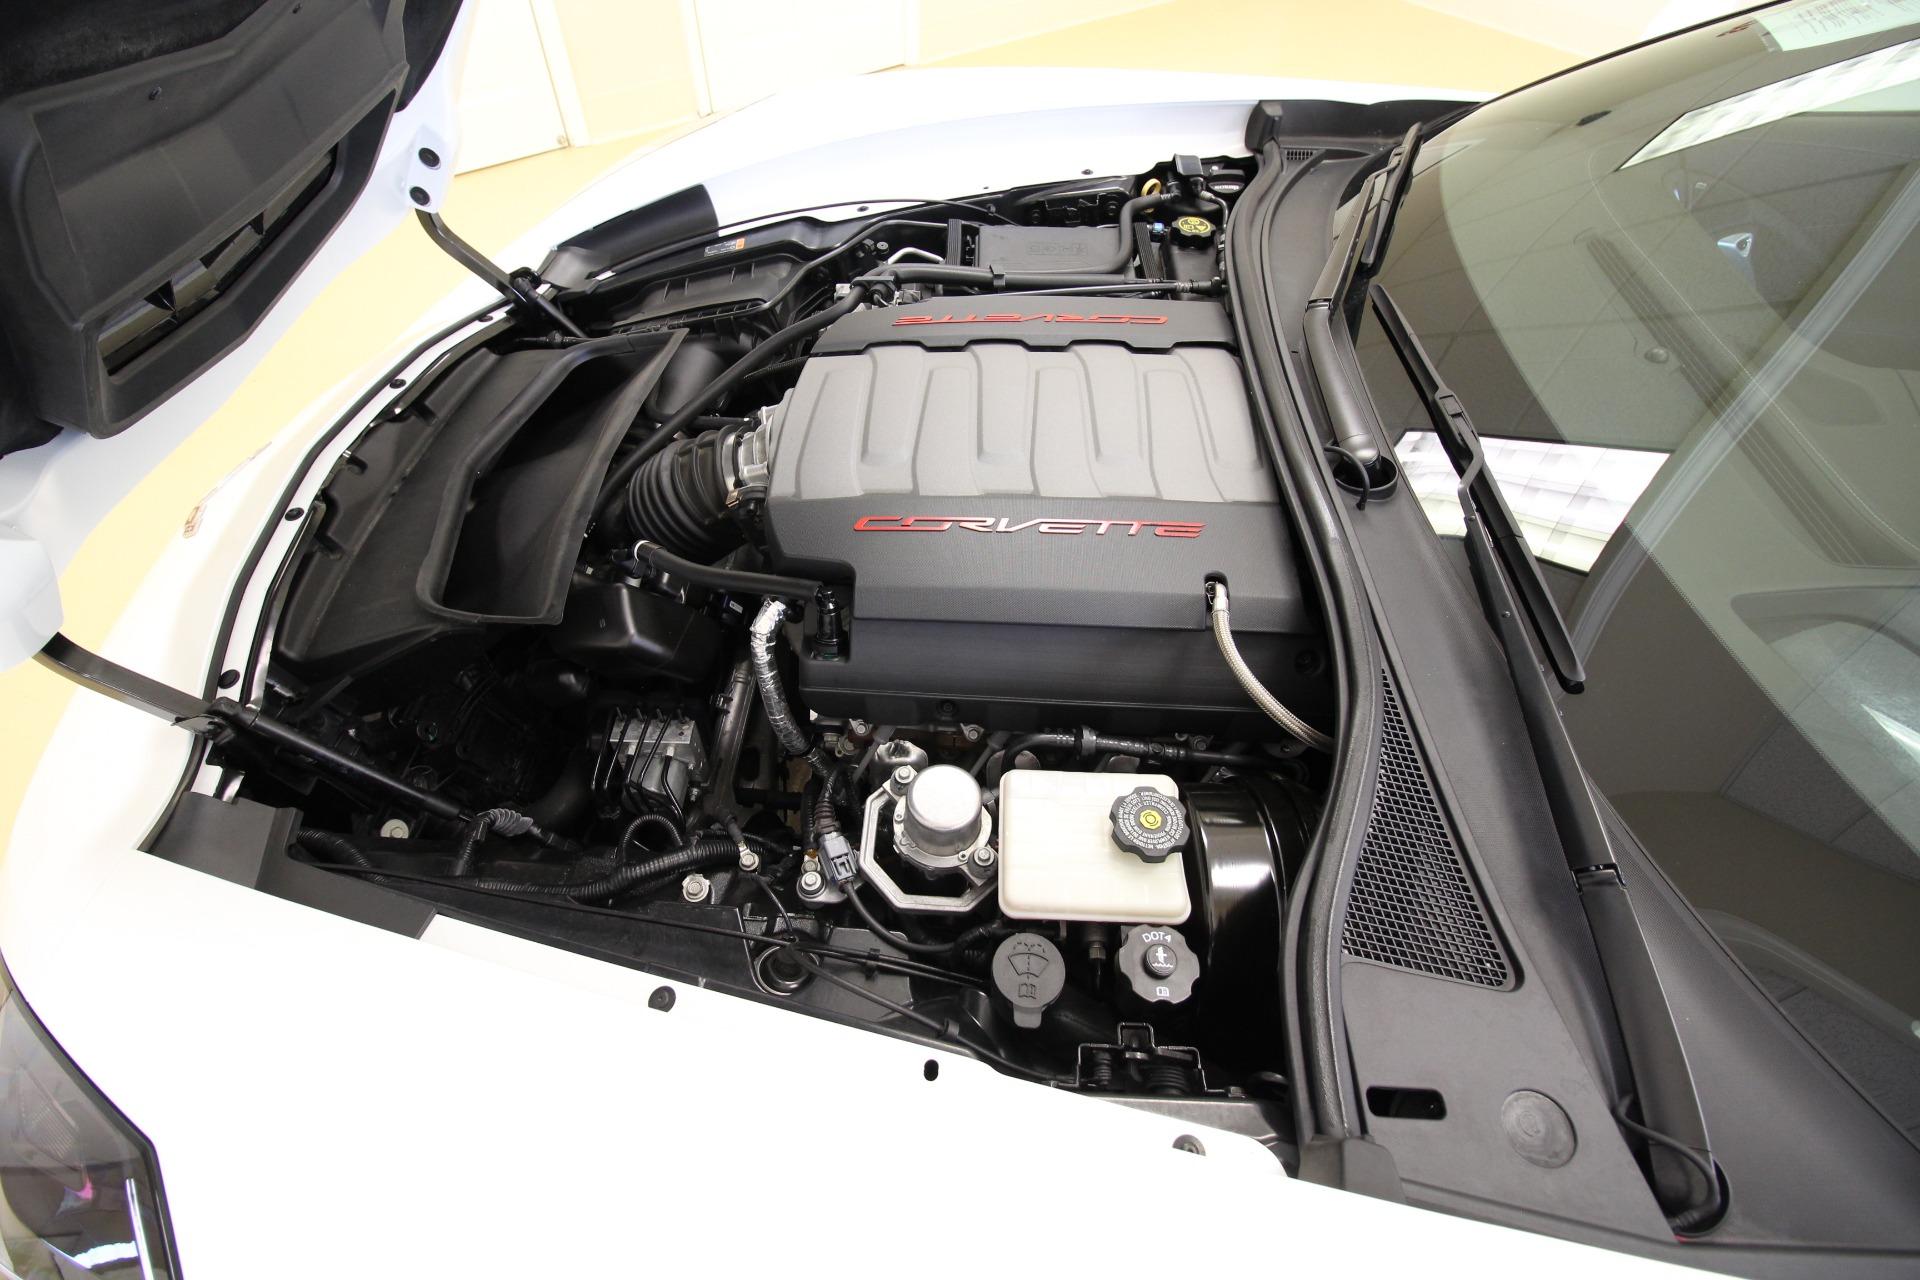 2014 chevrolet corvette stingray z51 2lt coupe manual